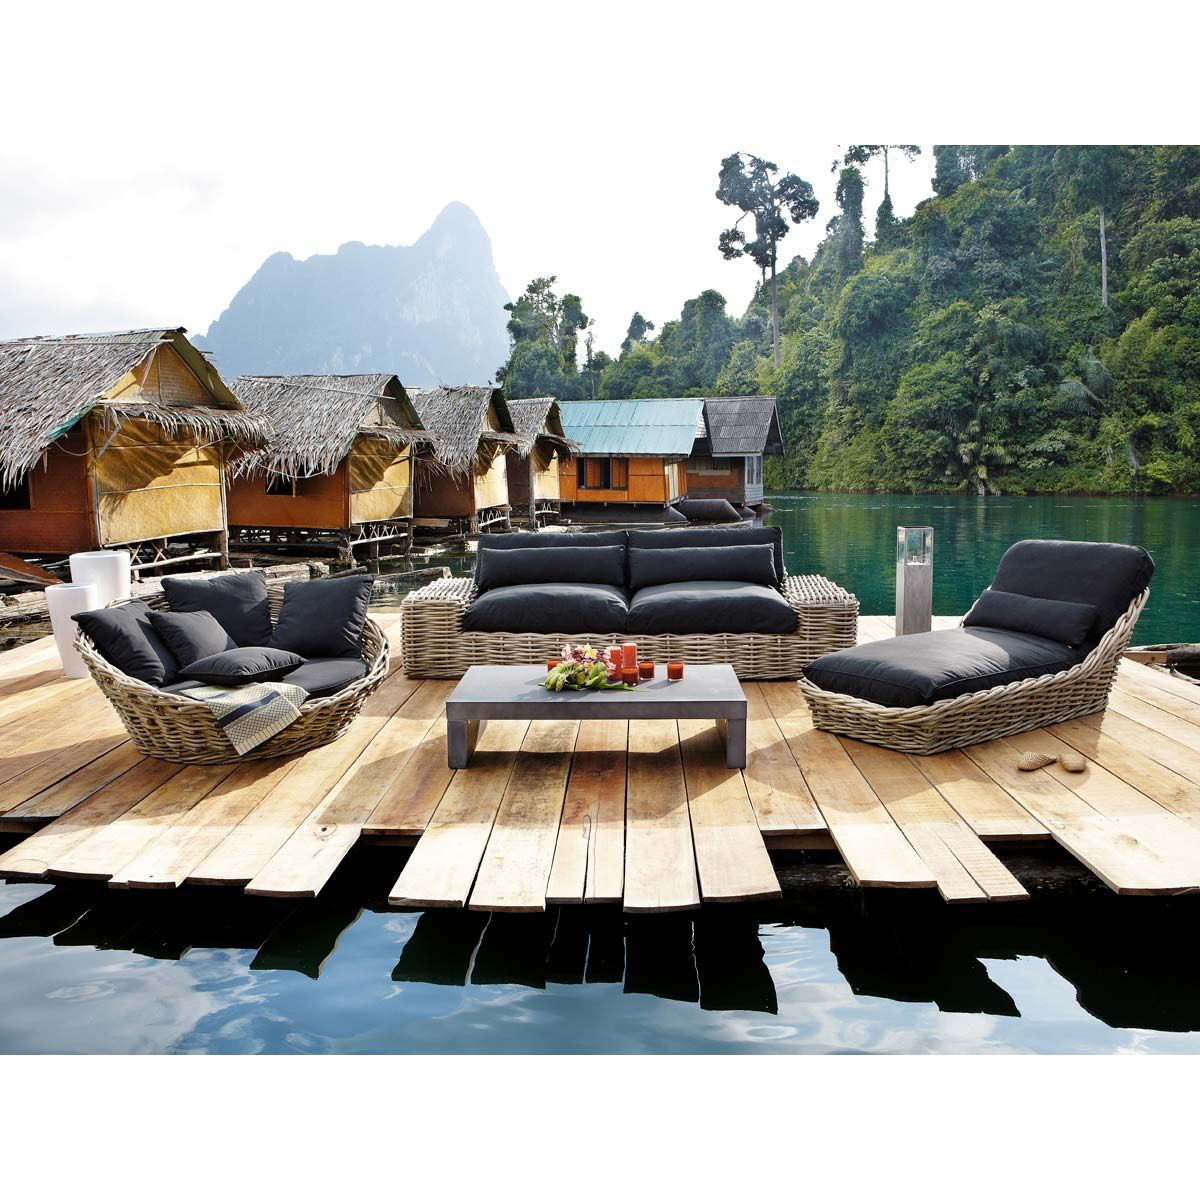 Outdoor Furniture In 2020   Outdoor Furniture Sets, Outdoor ... dedans Table De Jardin Maison Du Monde